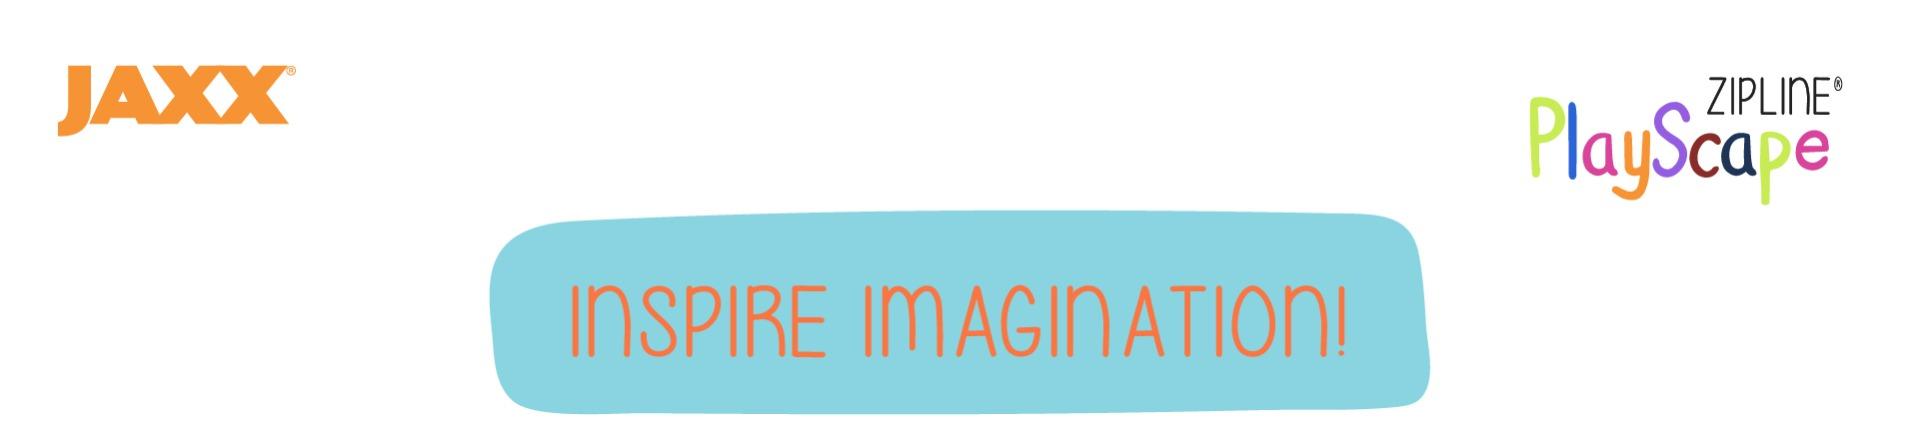 Jaxx Zipline Playscape   Inspire Imagination